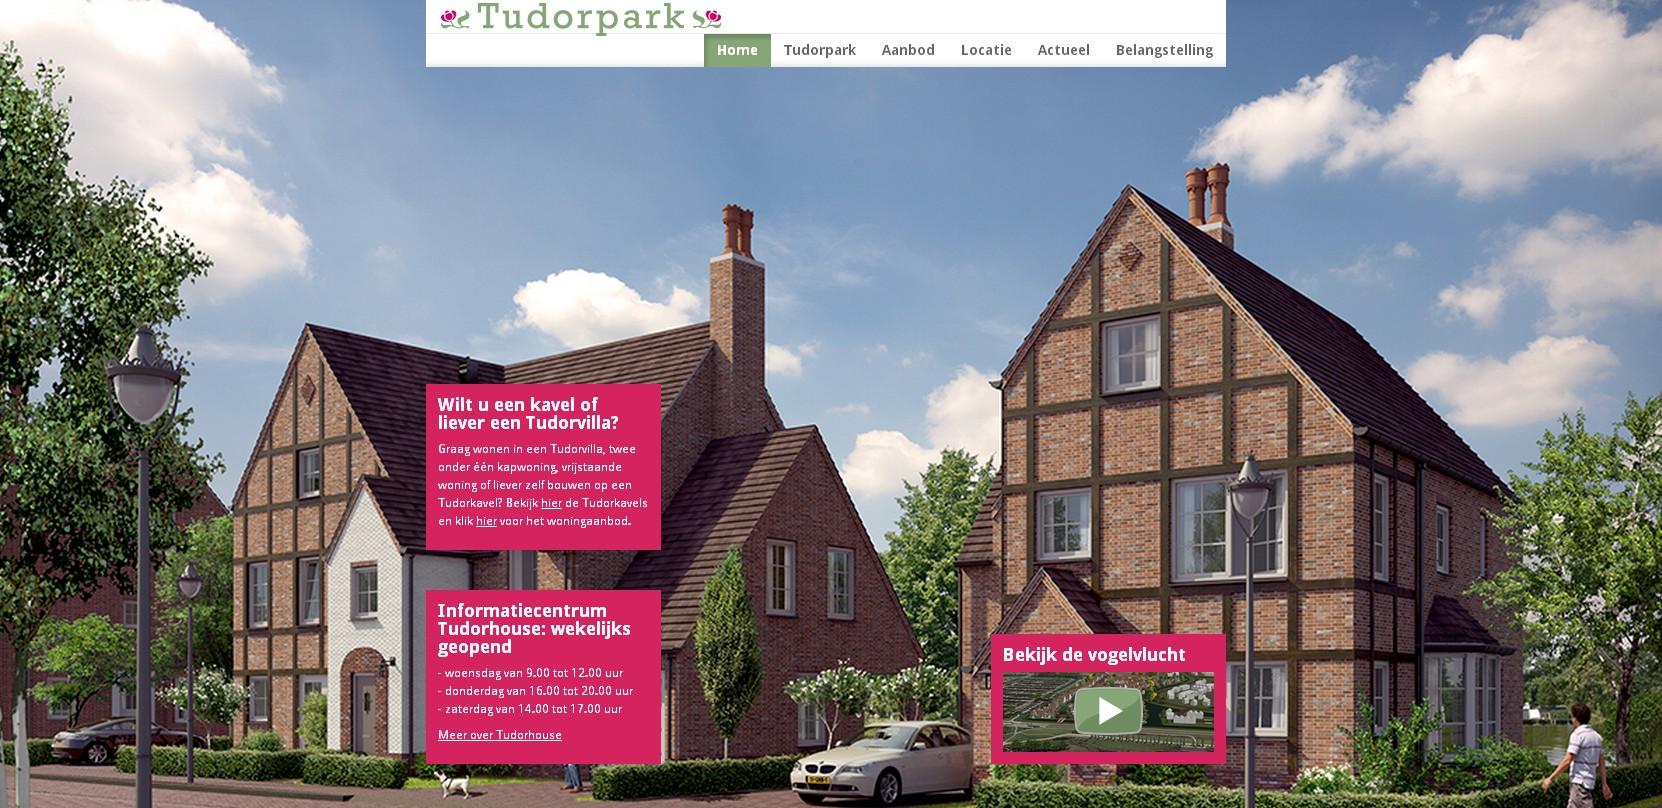 Tudorpark te Hoofddorp Desaunois